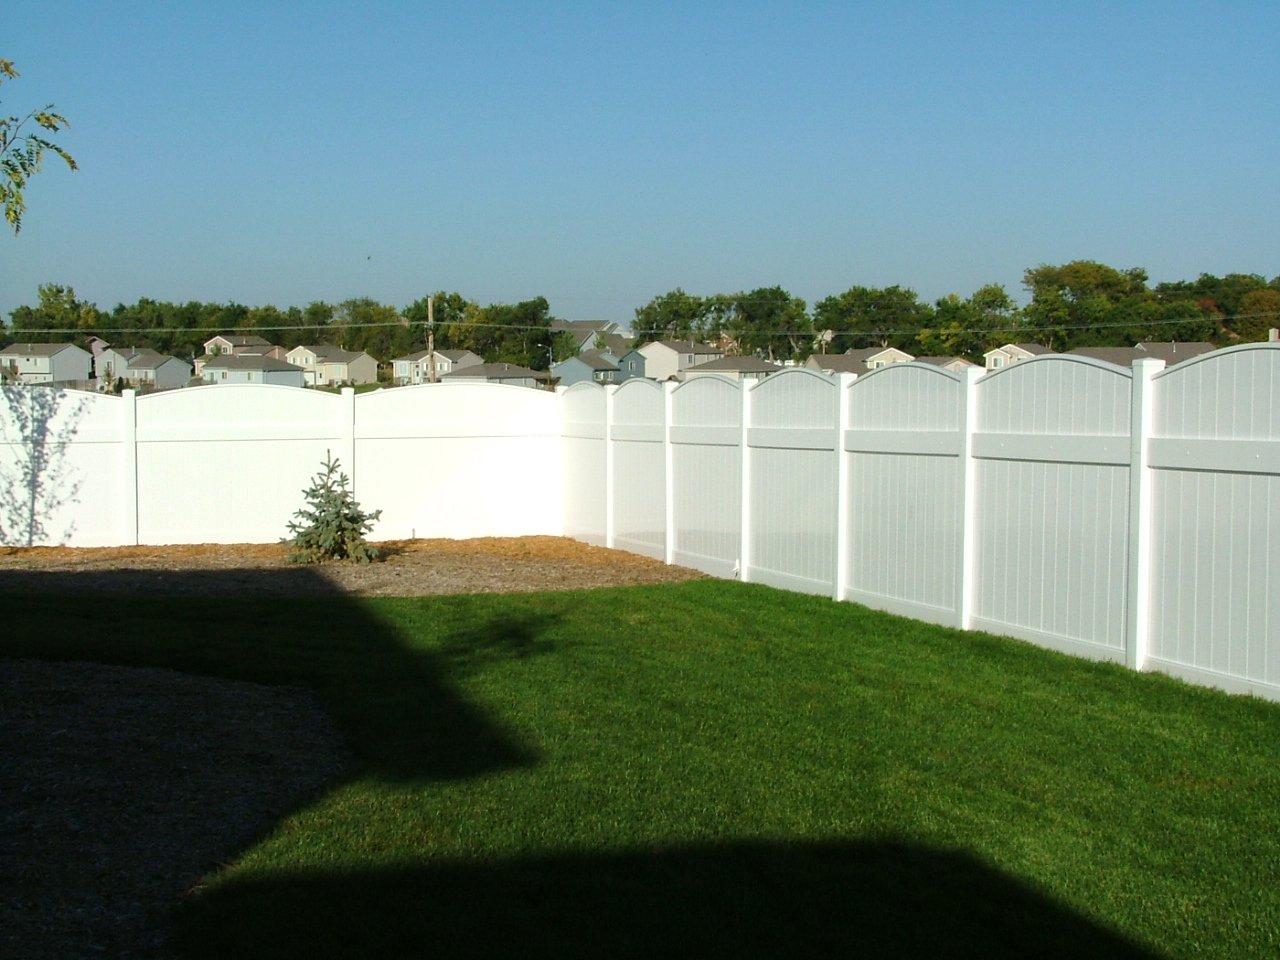 Dakota Fence & Deck 6' solid pvc scalloped up fence - Omaha and Papillion, Nebraska